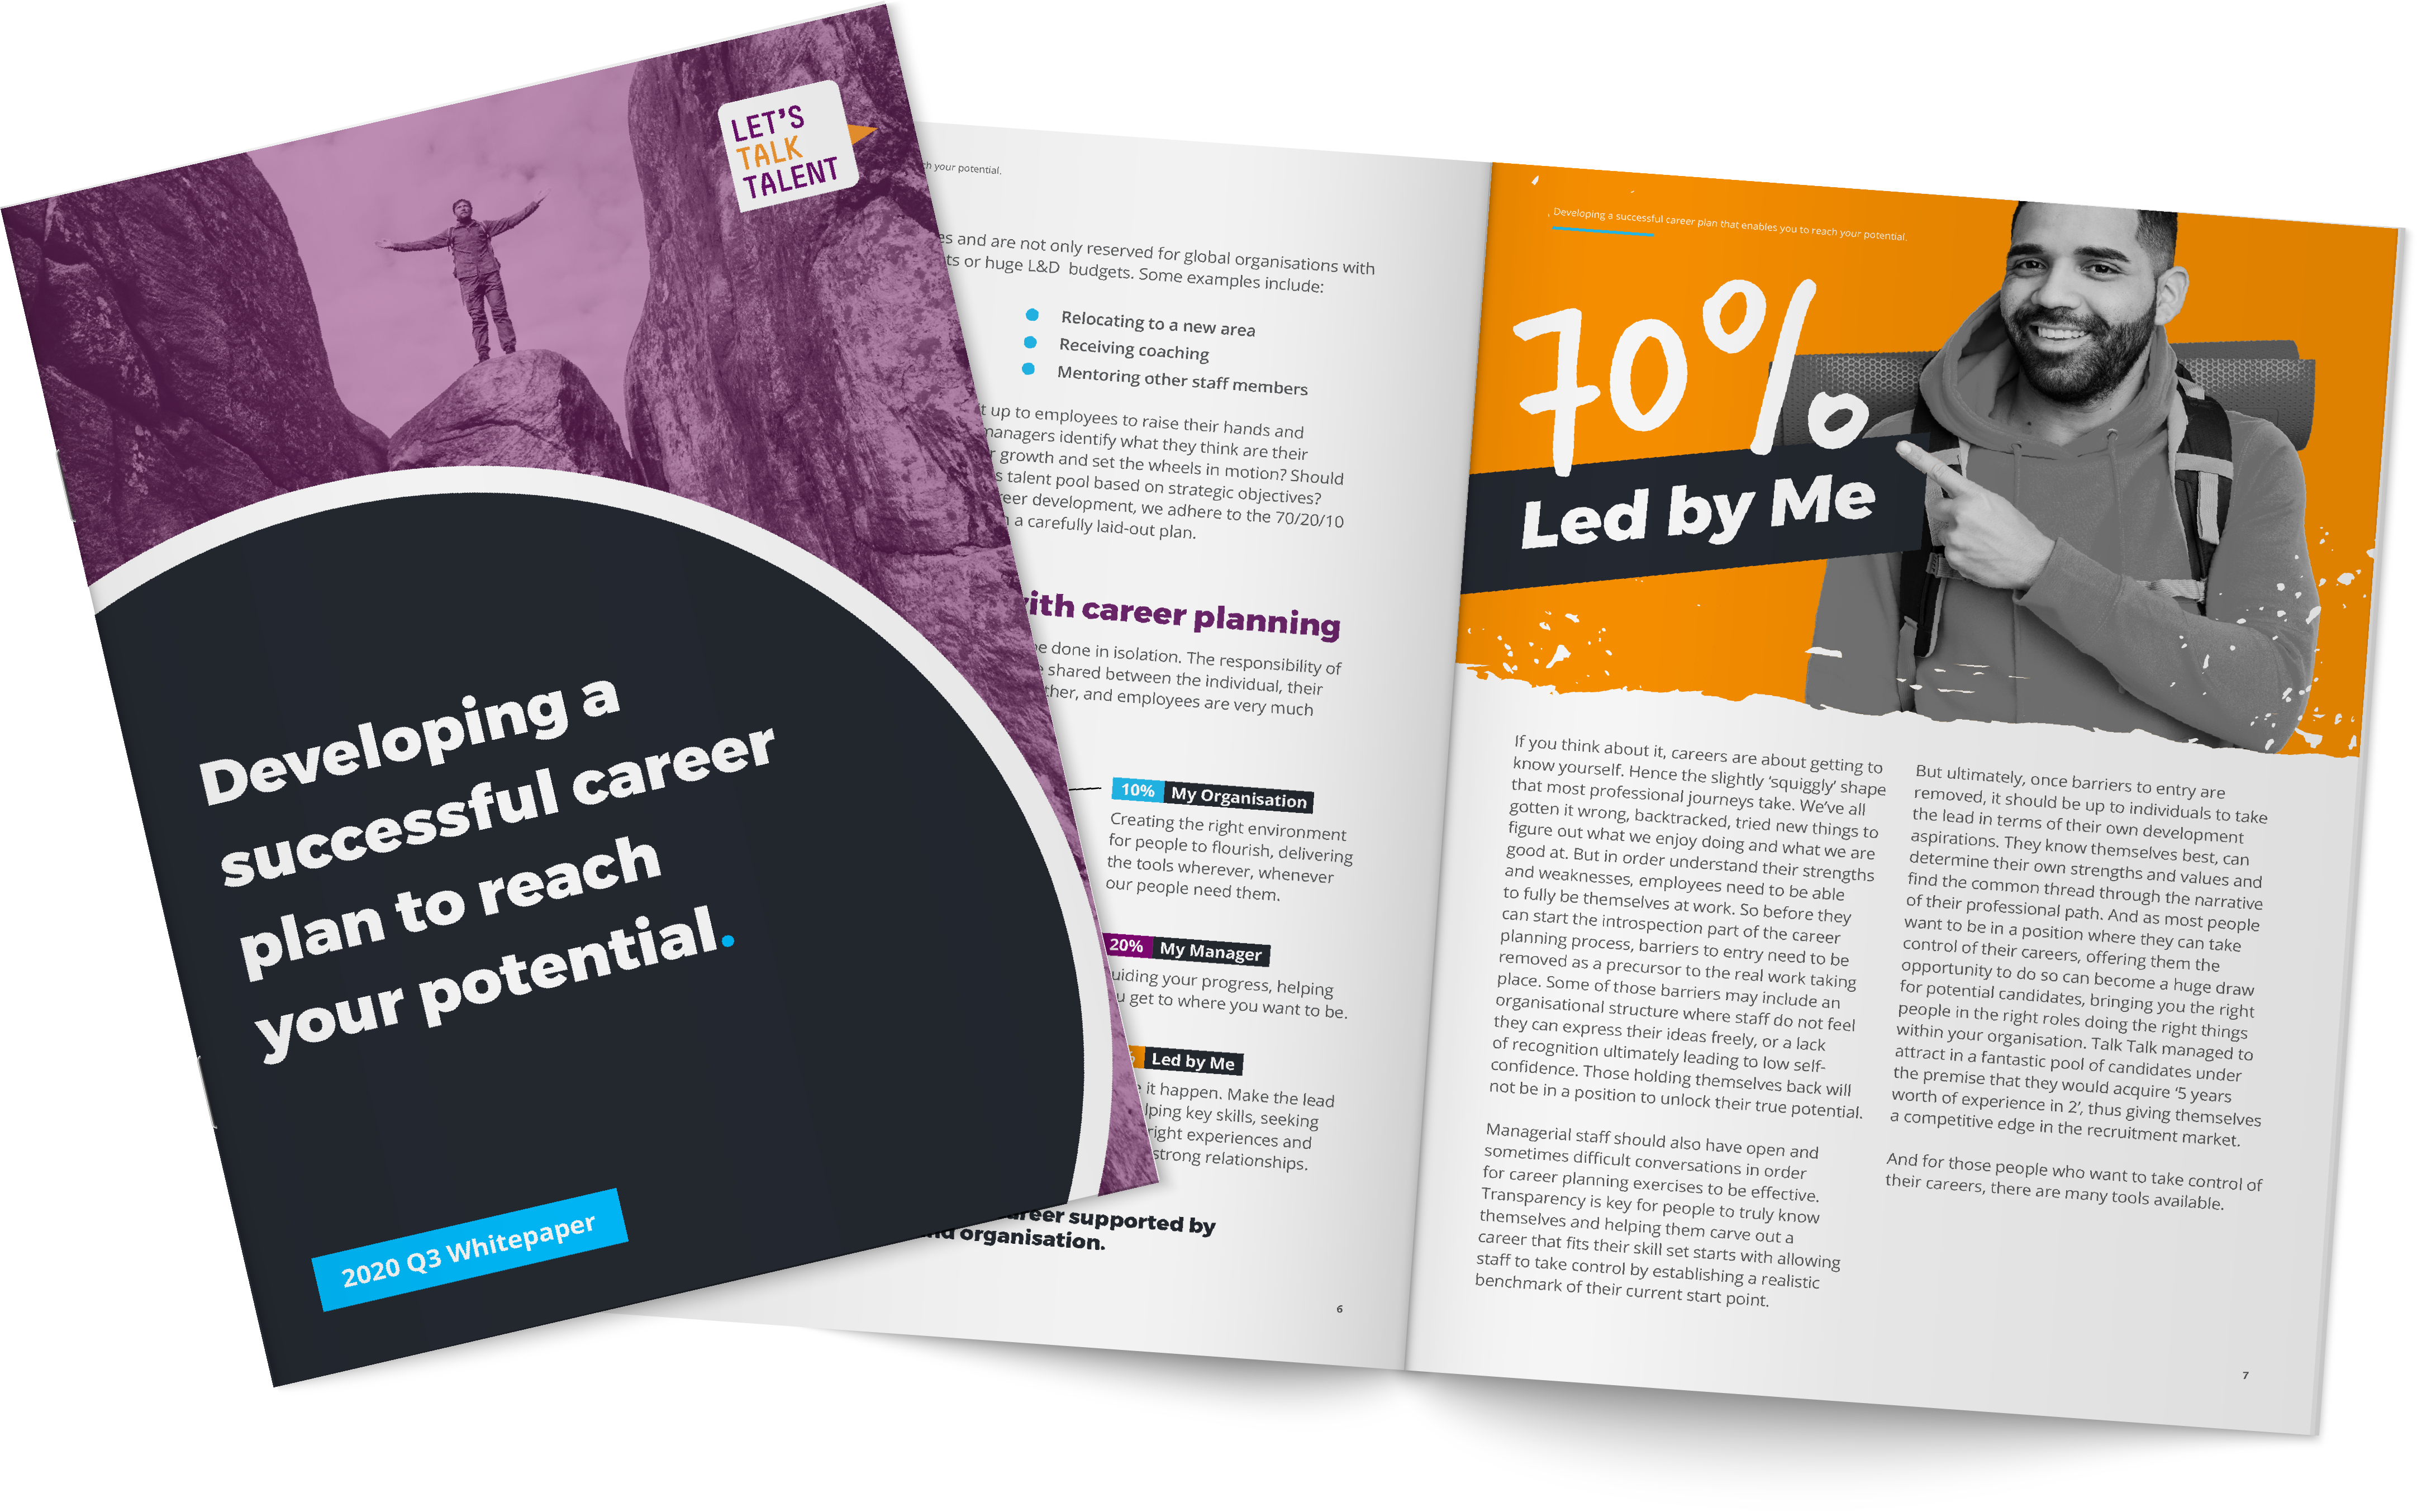 career-planning-whitepaper-promo